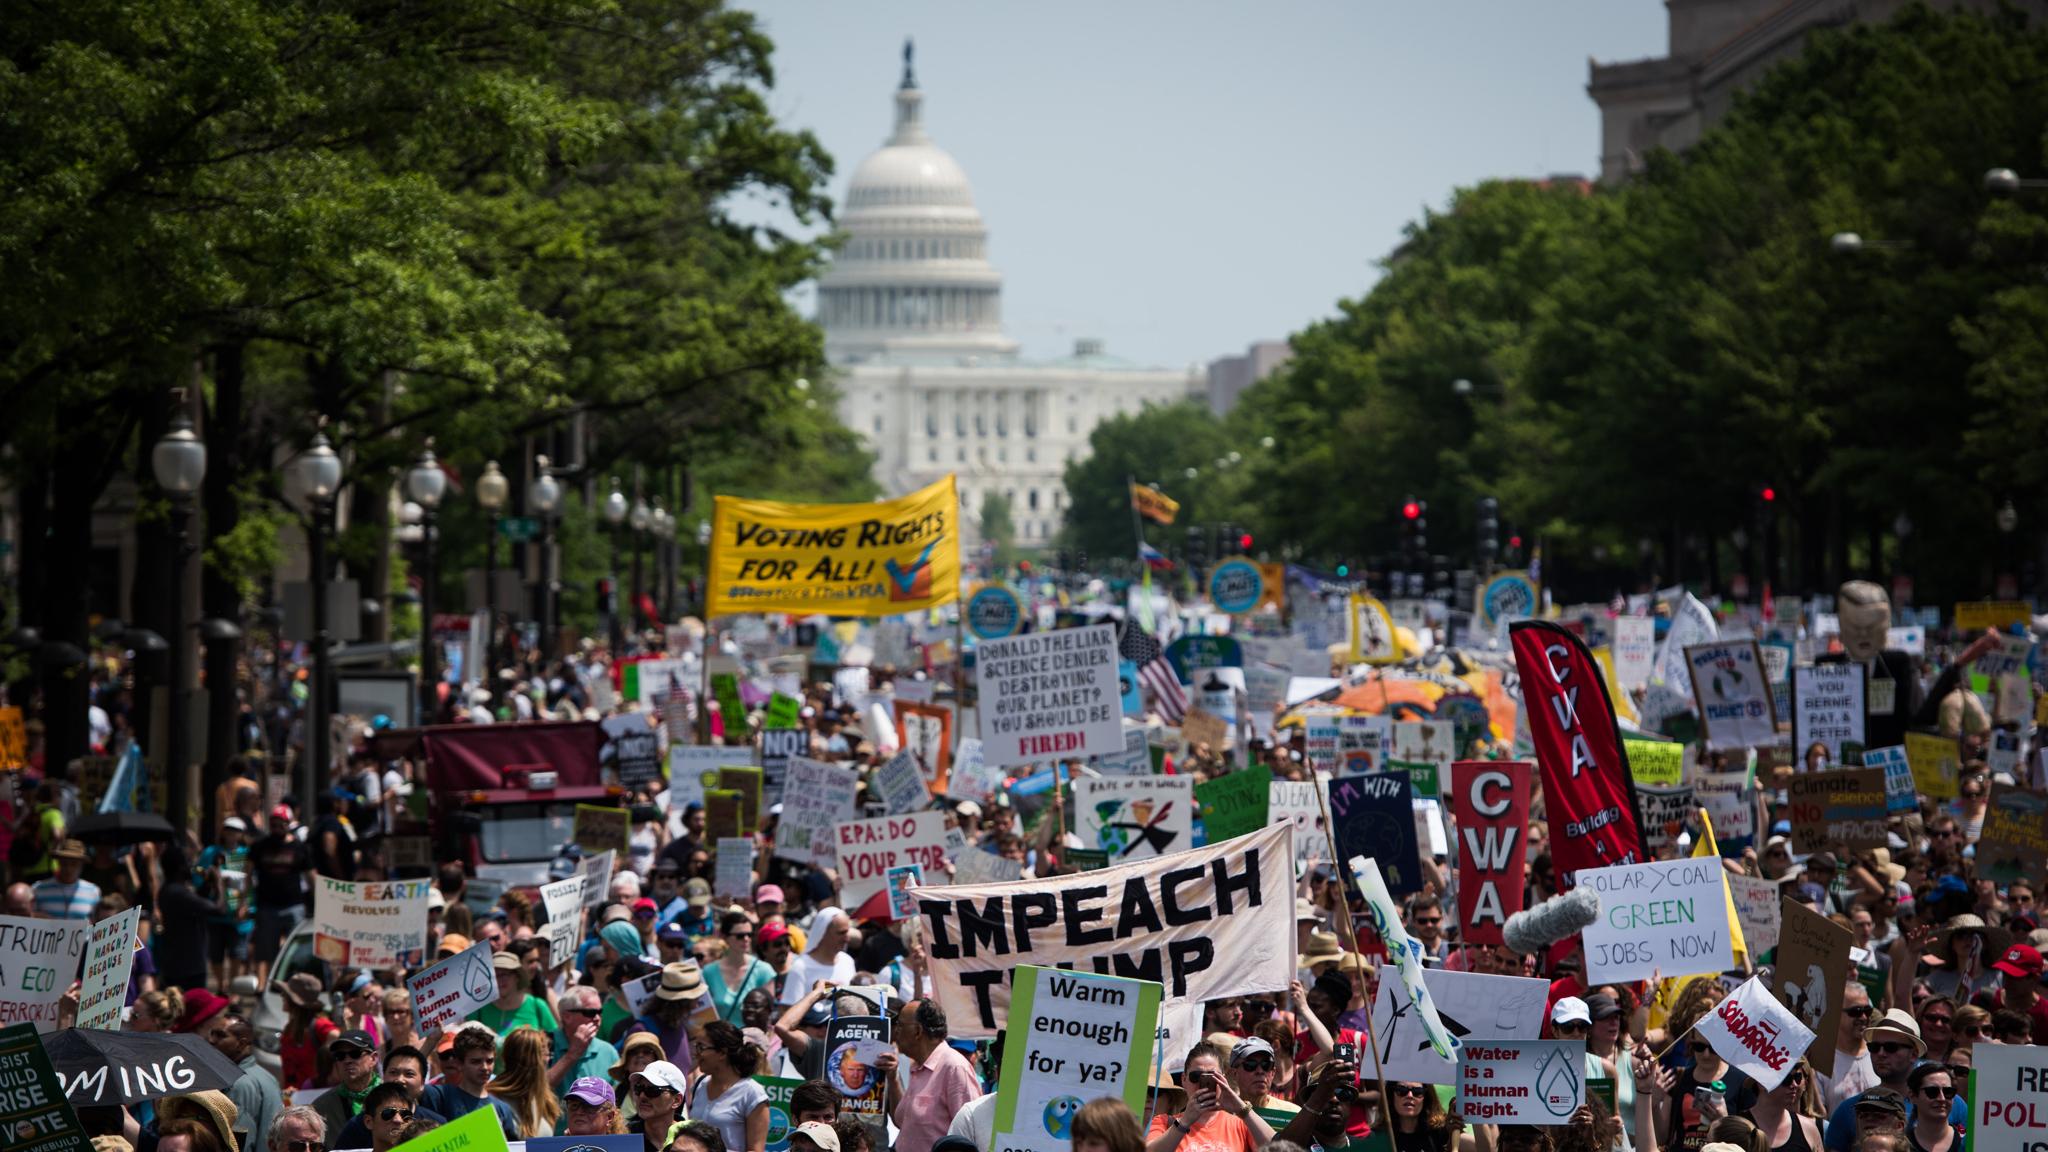 Diplomatprotest mot carla brunis skiva